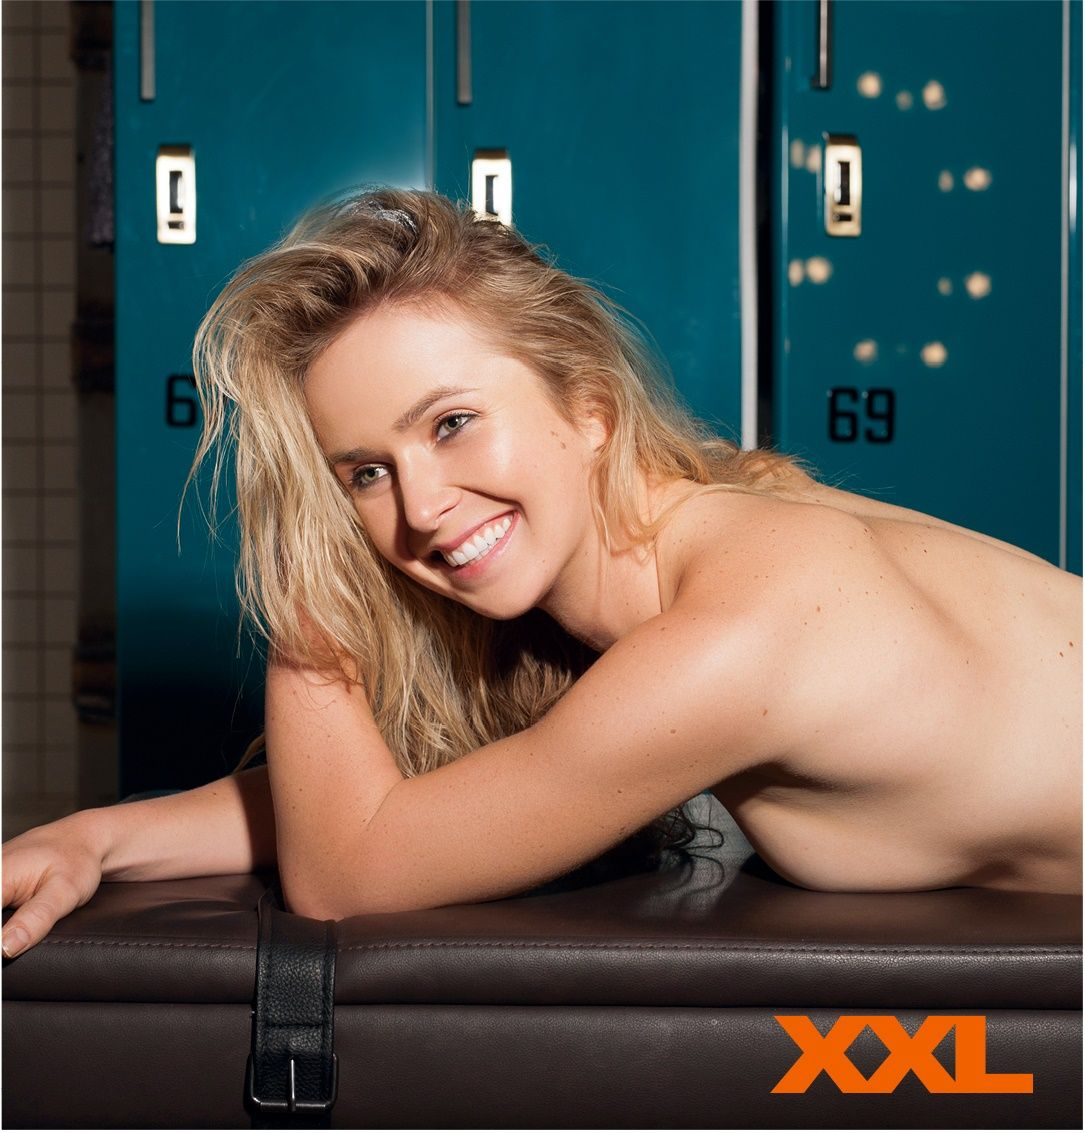 Elina-Svitolina-Sexy-Topless-5-thefappeningblog.com_.jpg